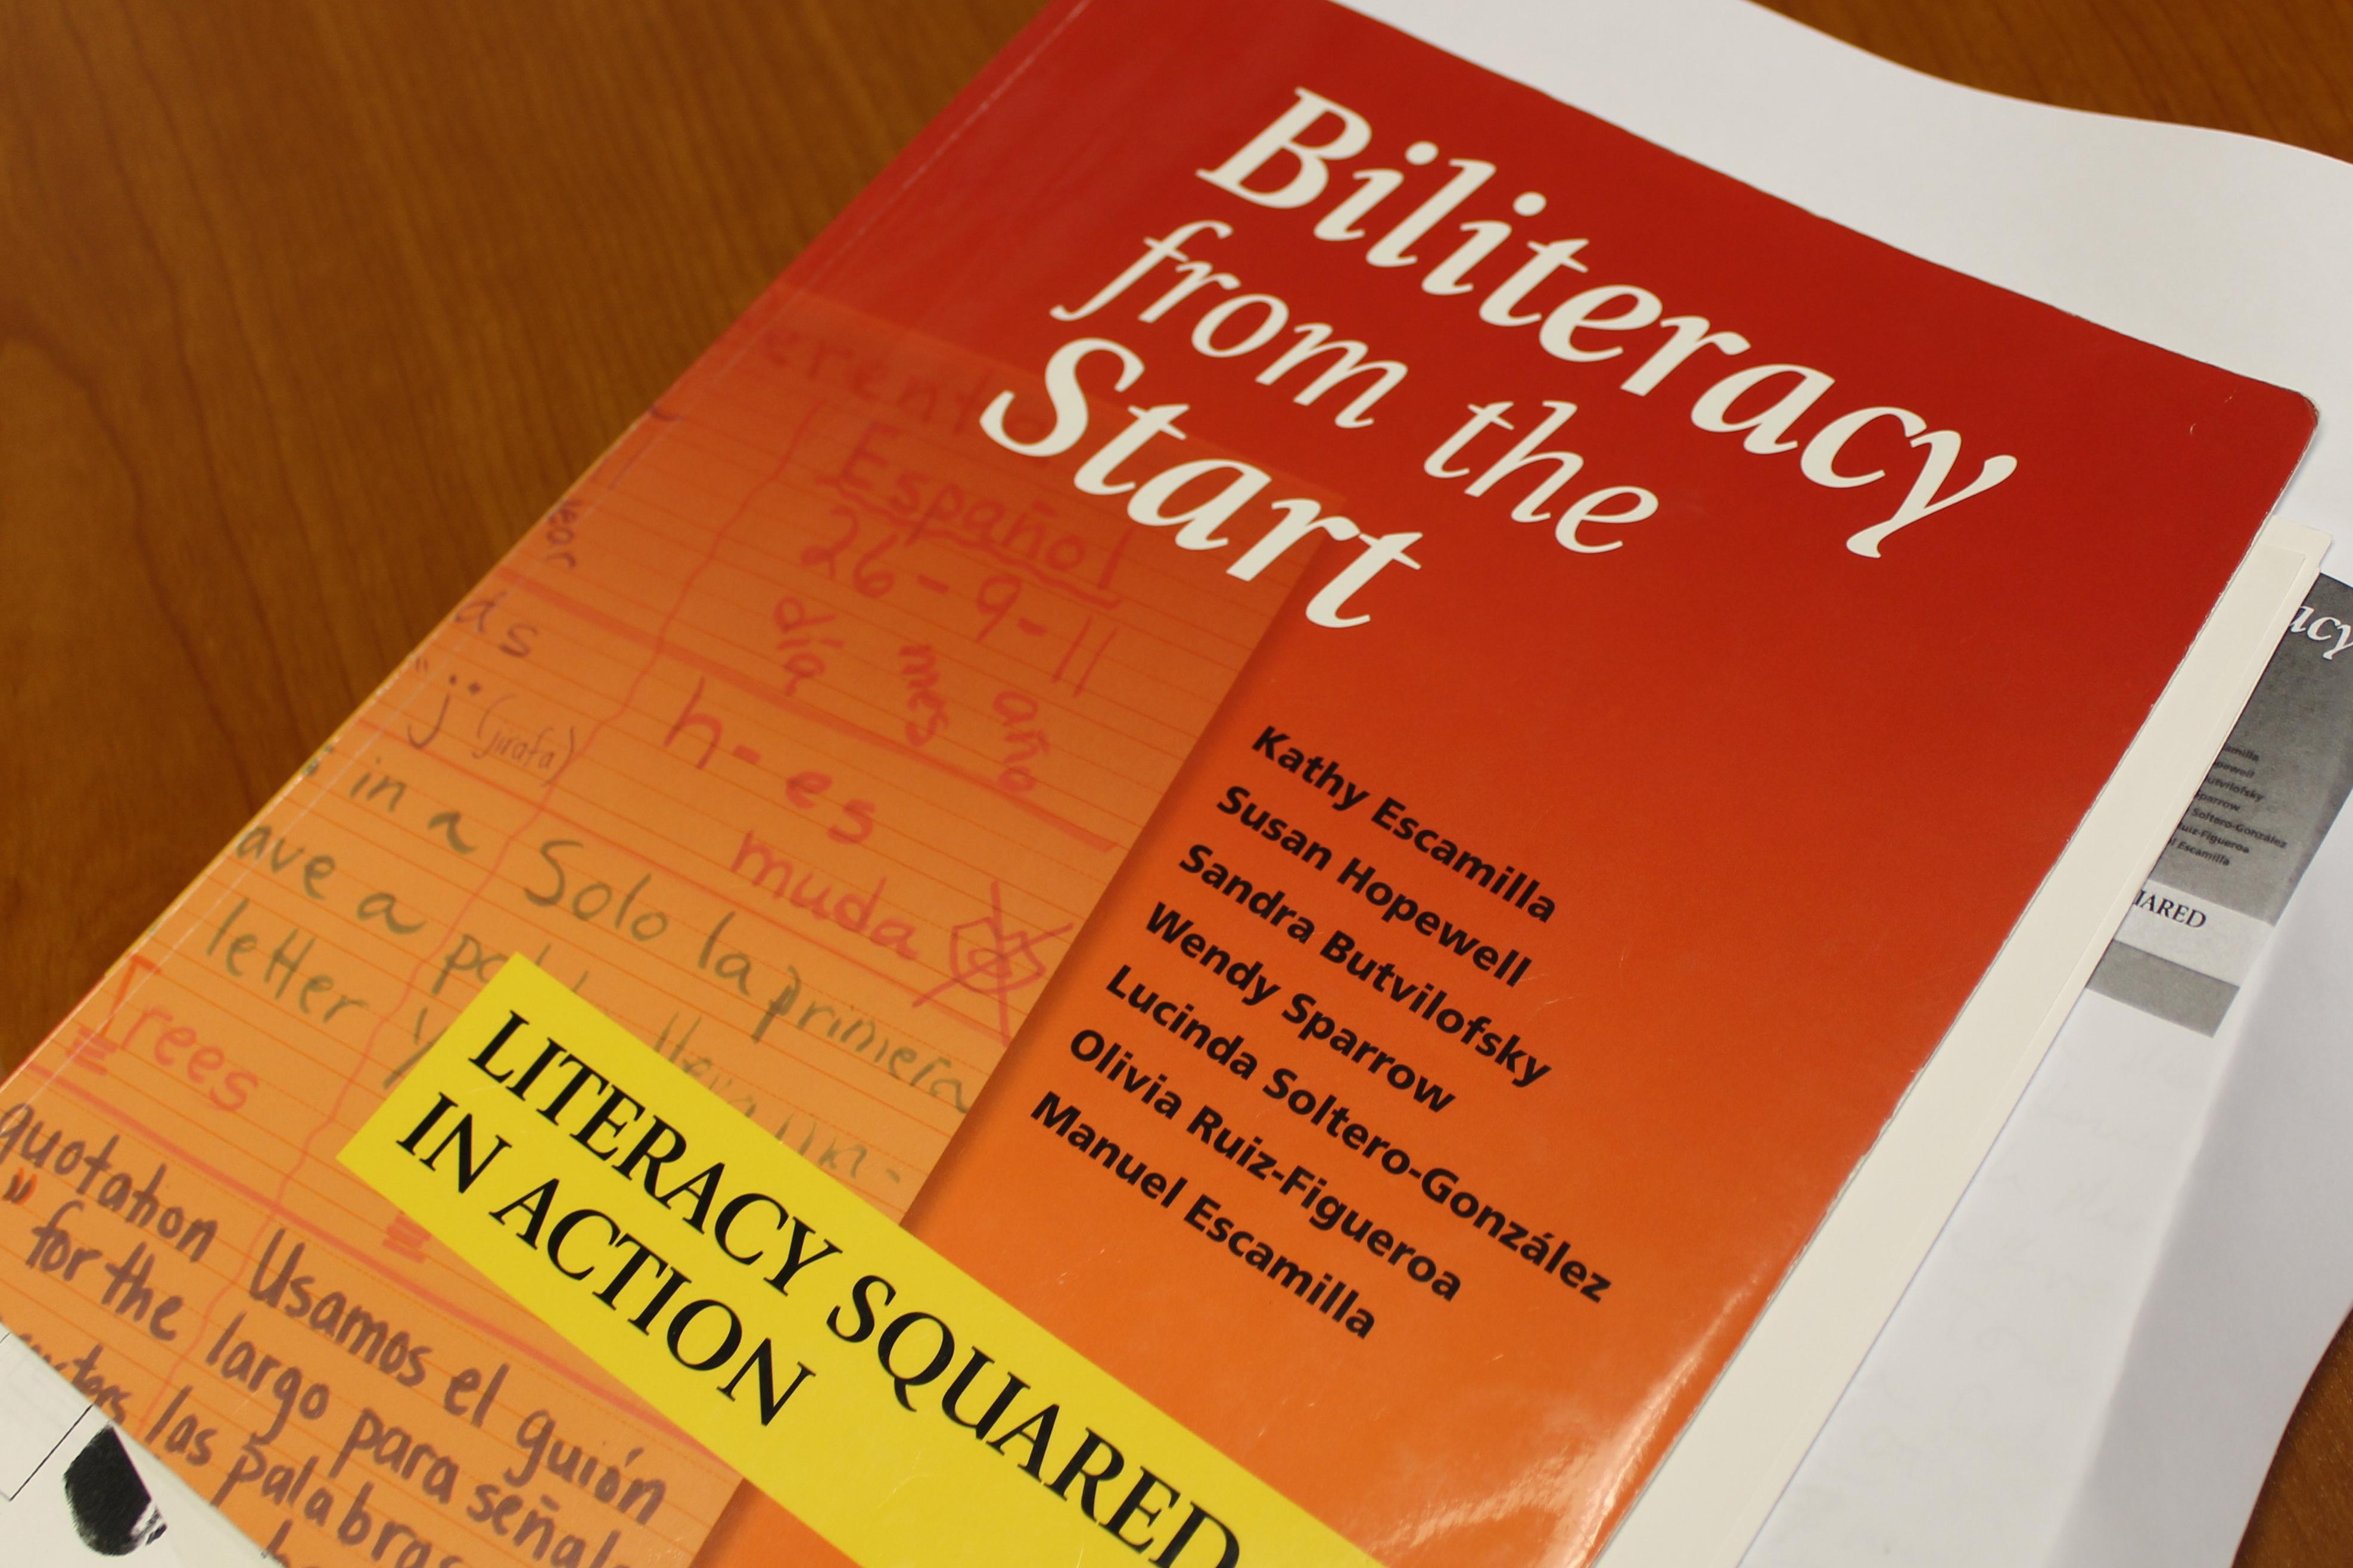 Biliteracy model